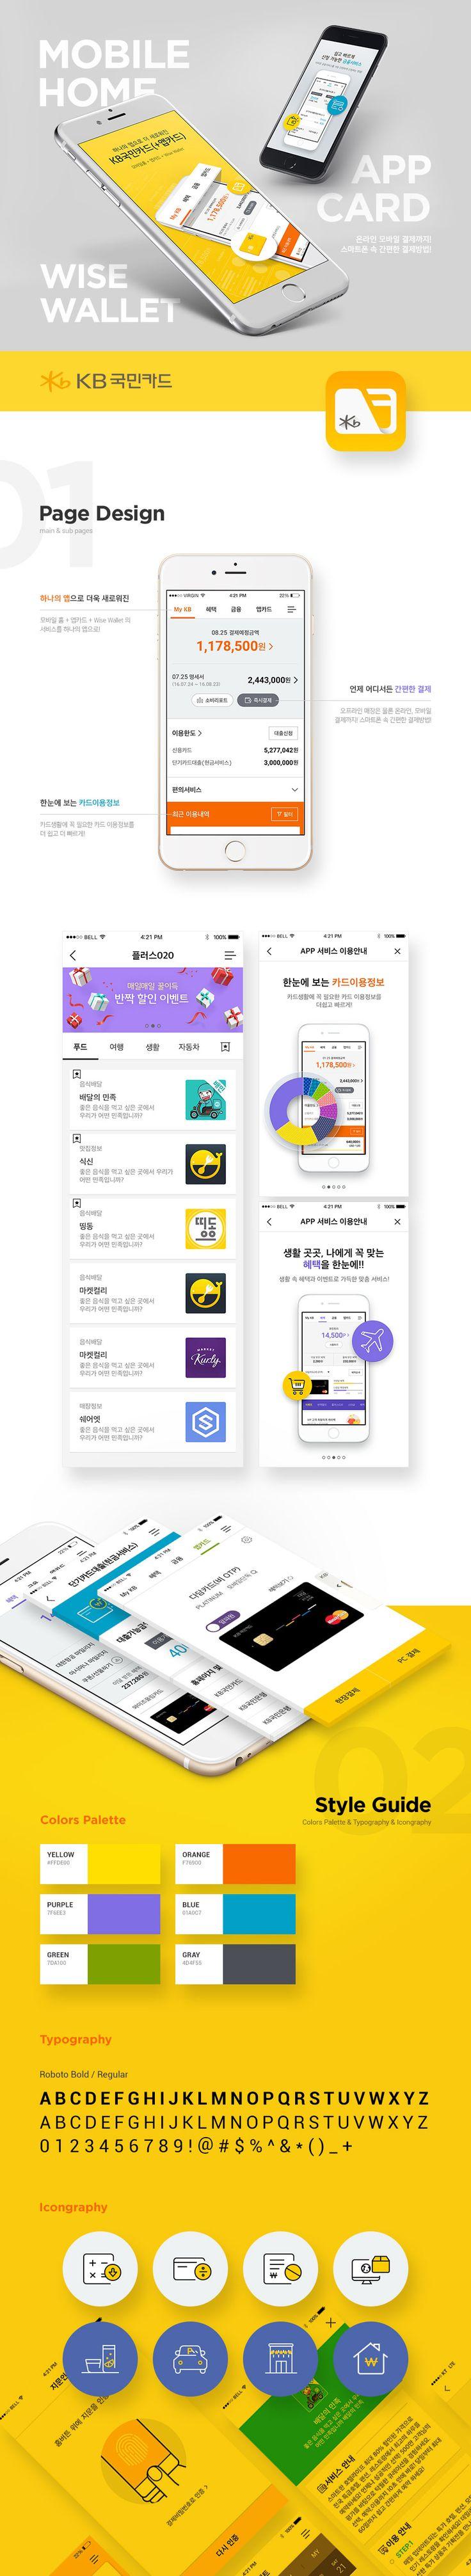 KB국민카드 통합APP 구축detail image